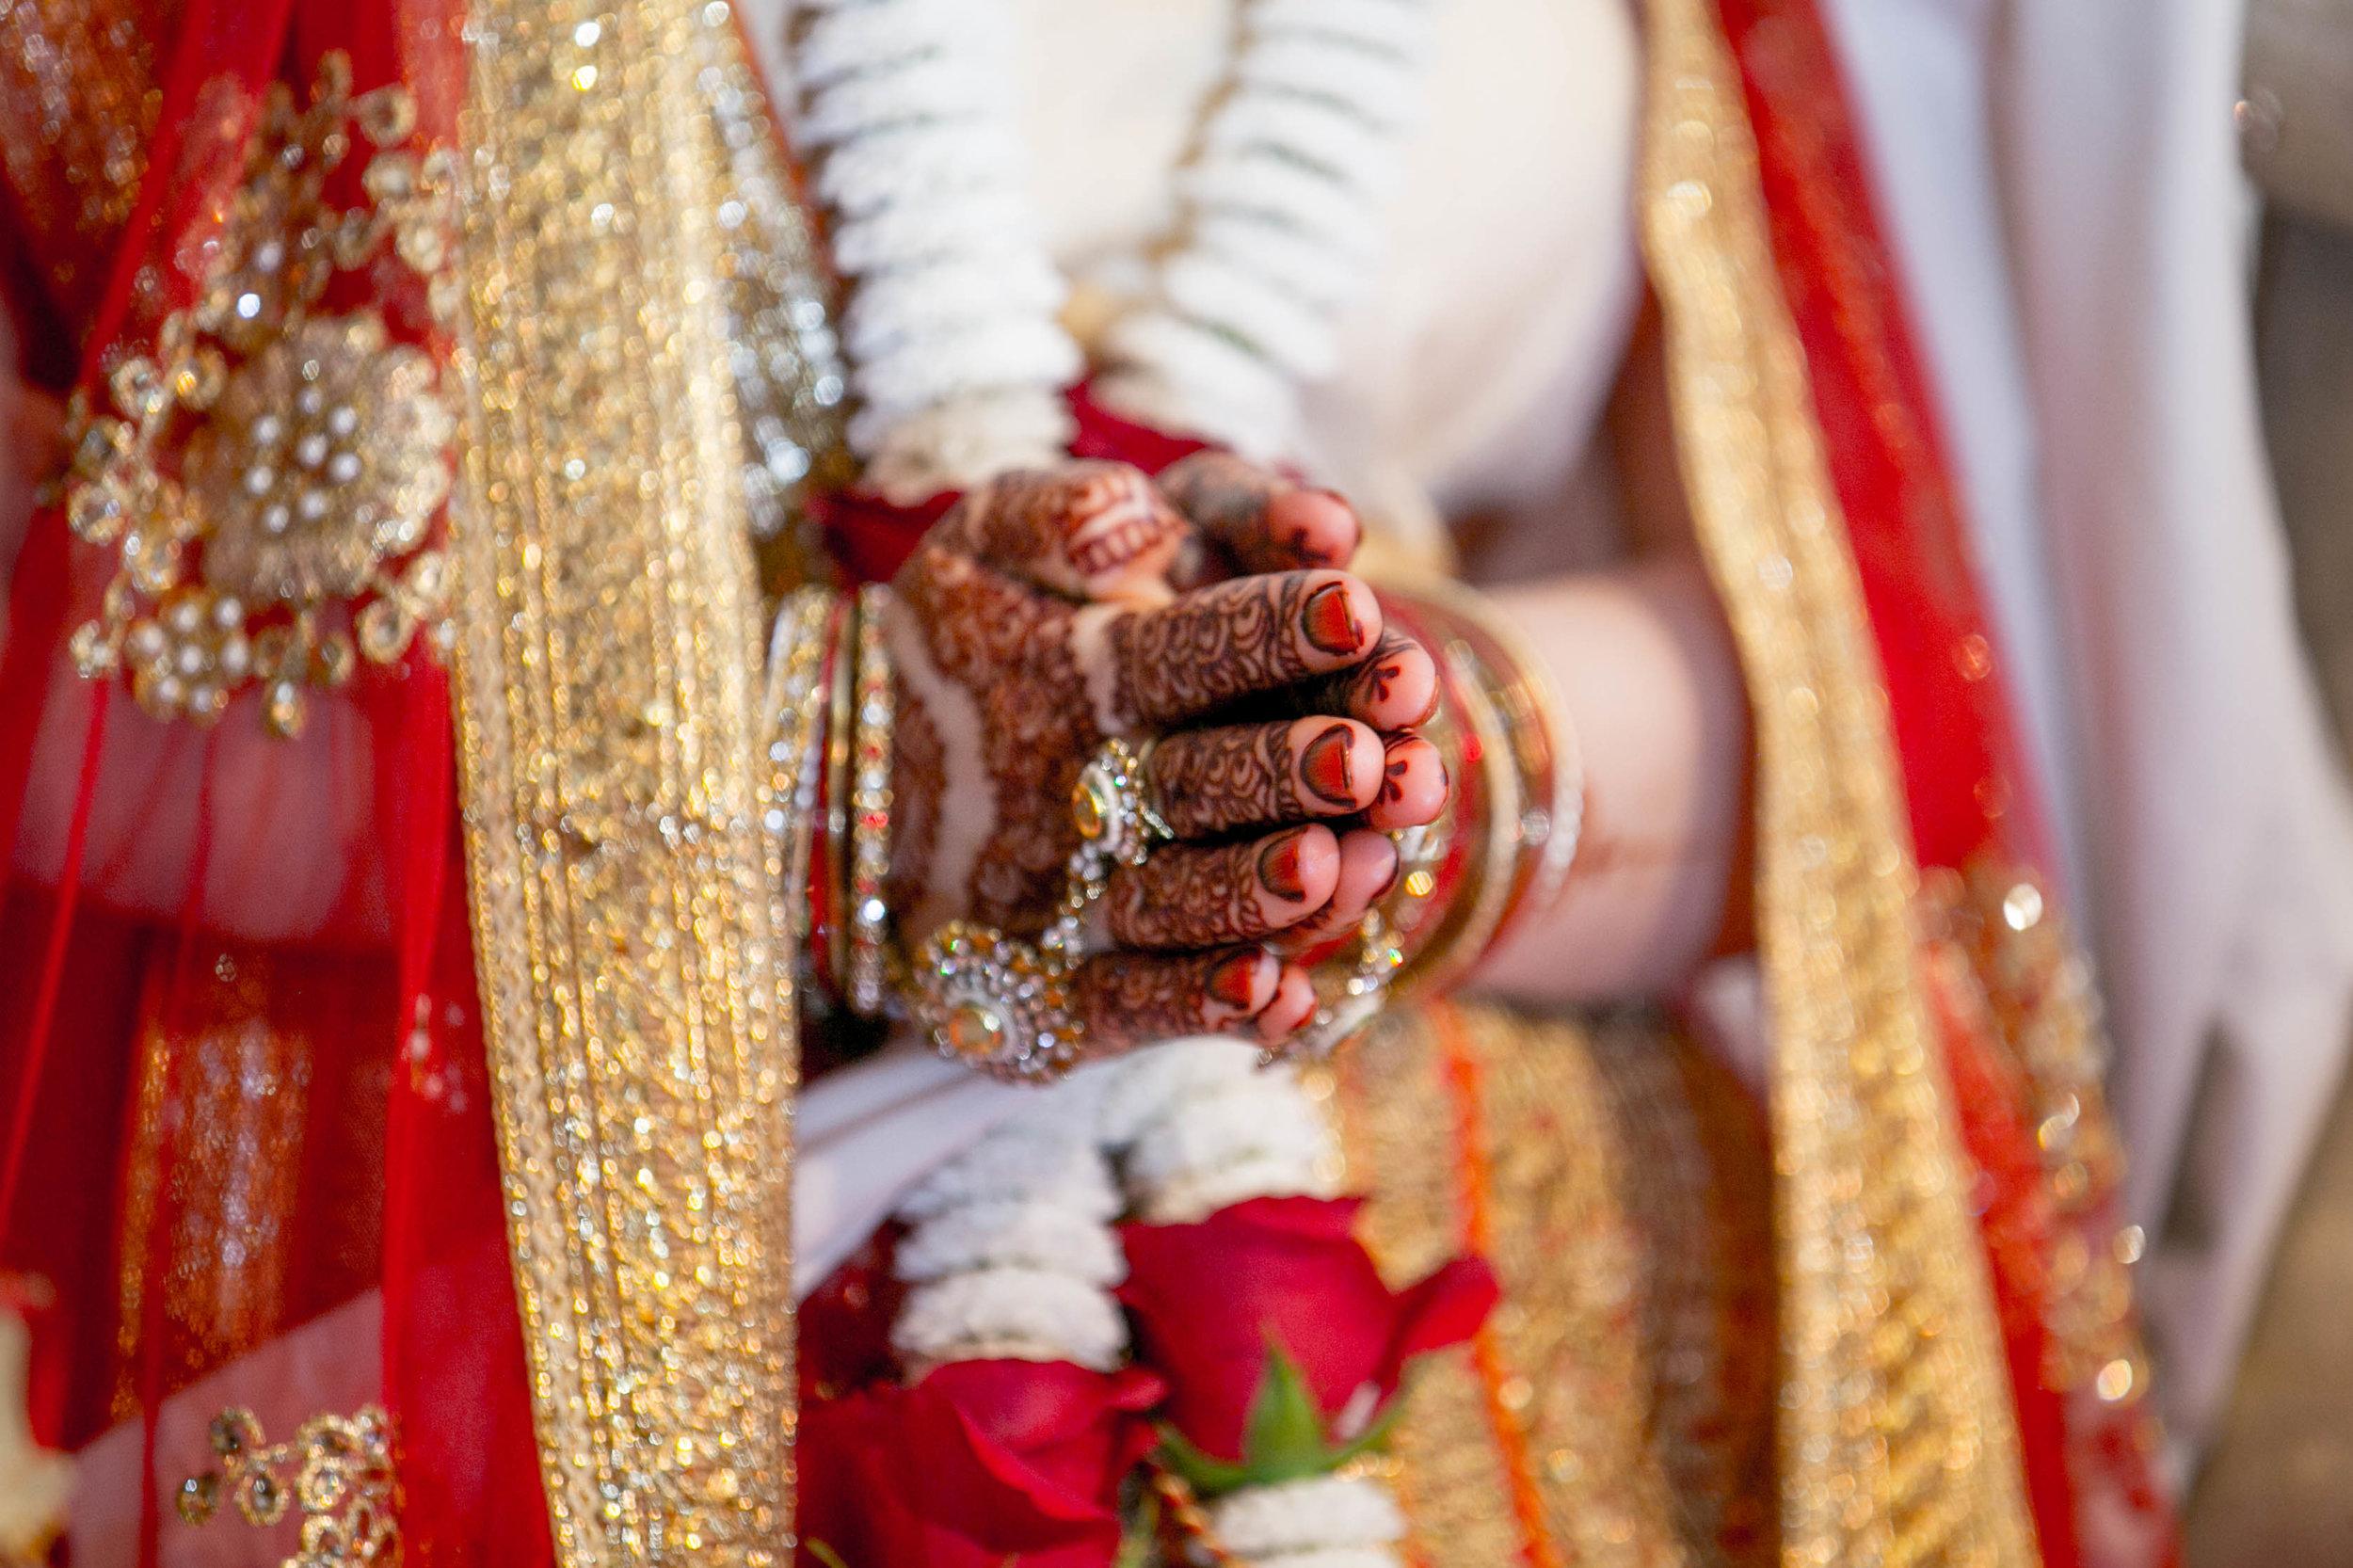 asian-Hindu-wedding-photographer-london-natalia-smith-photography-48.jpg